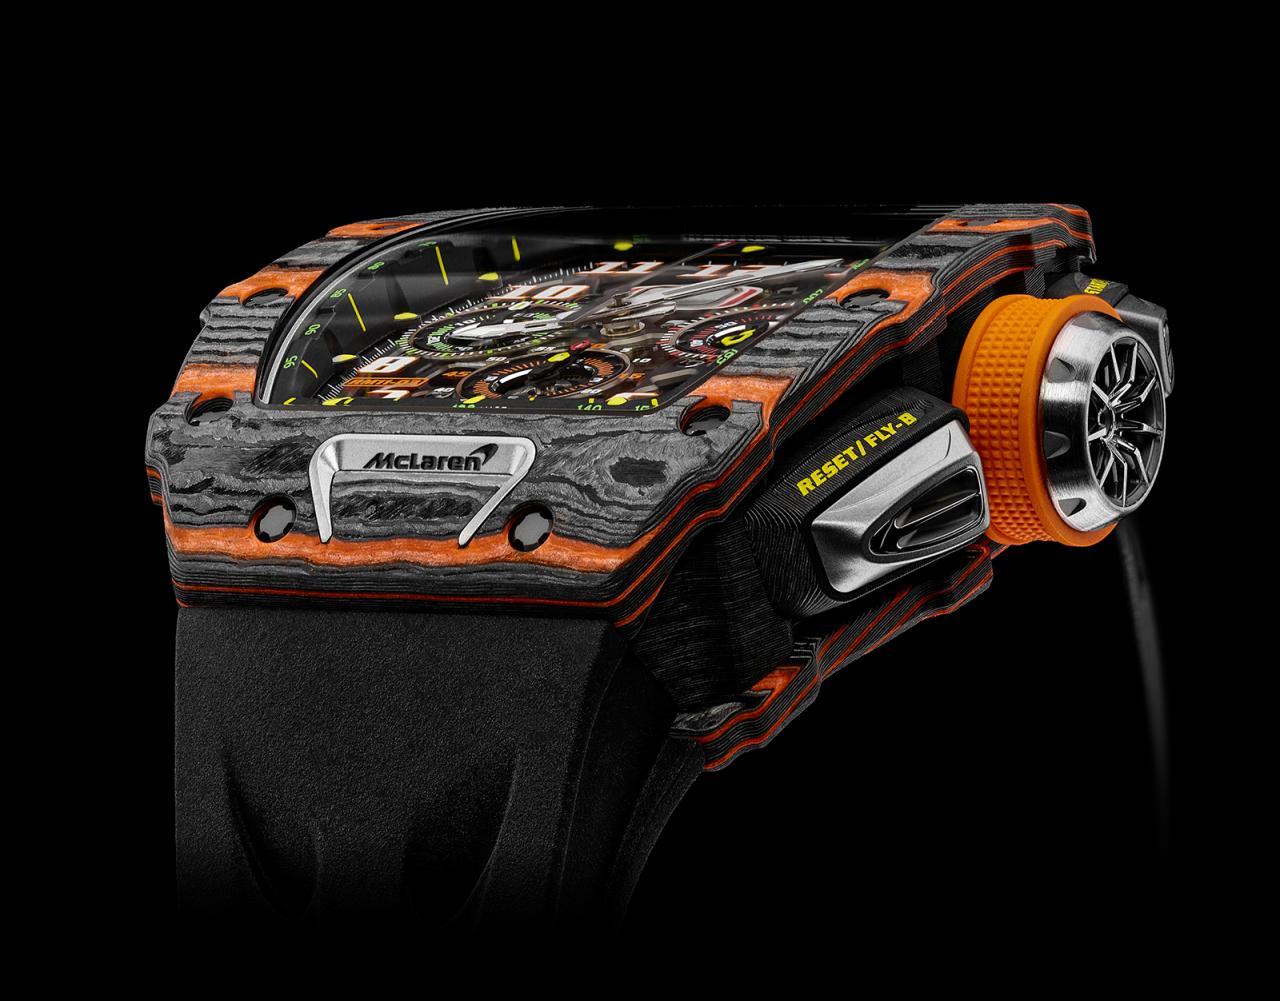 Richard Mille RM 11-03 McLaren 6